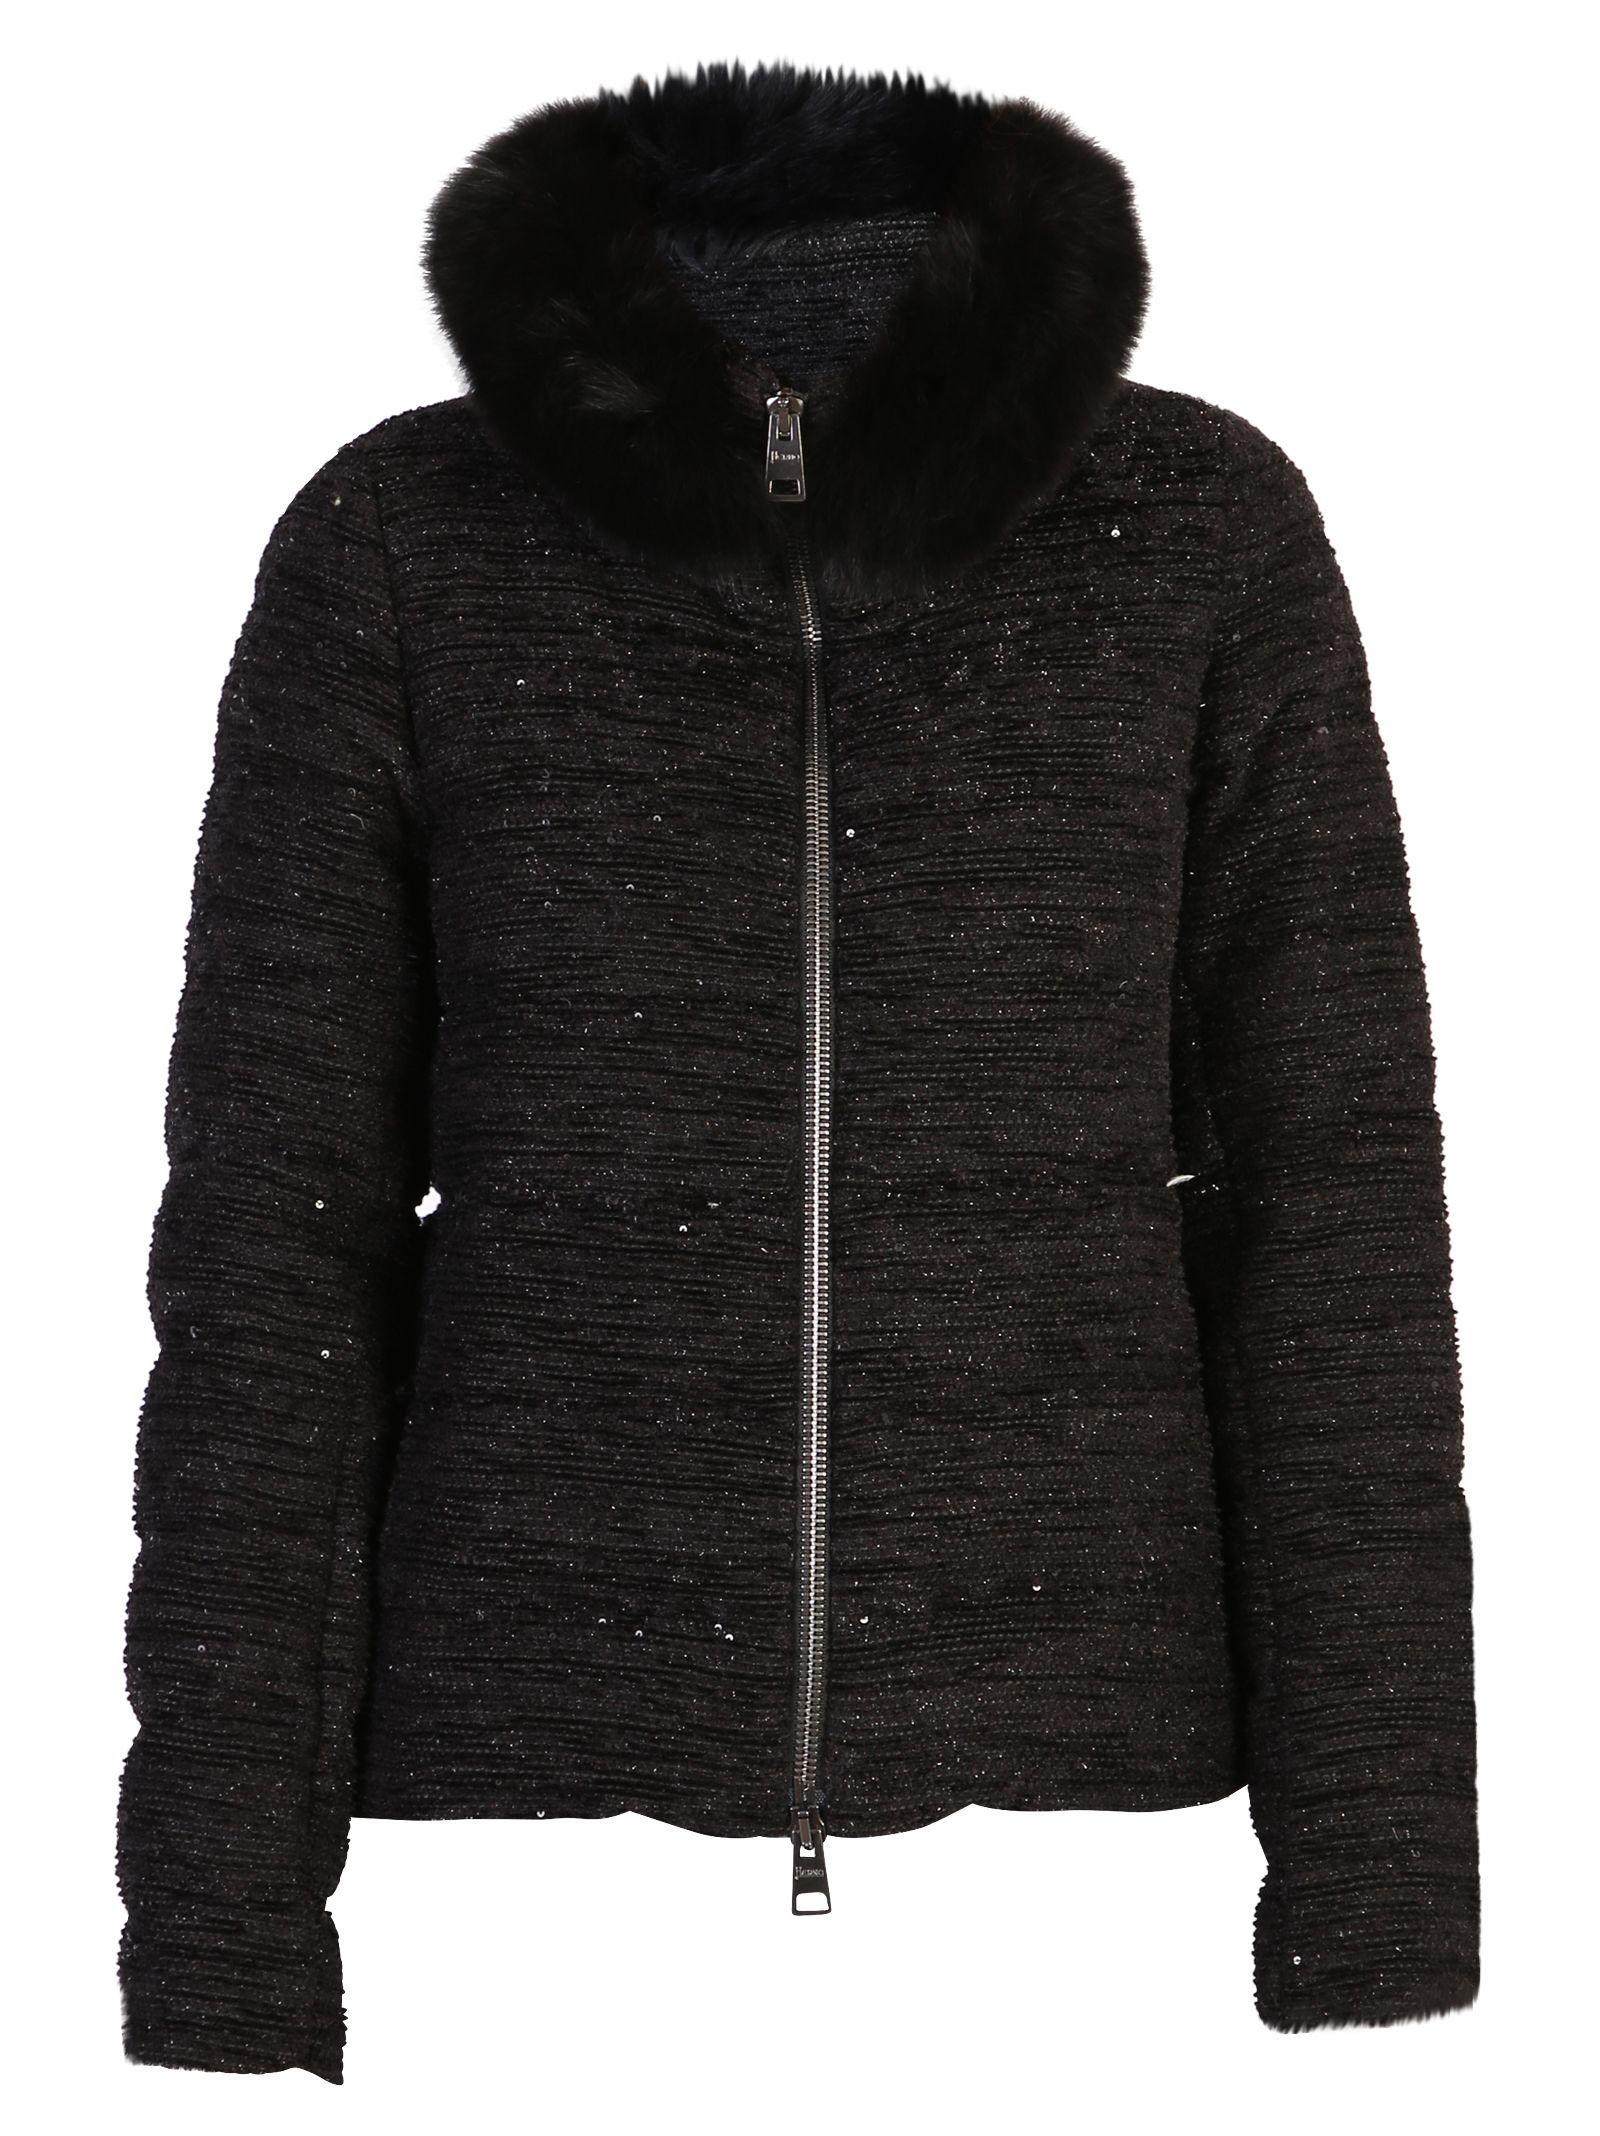 Black Lurex Padded Jacket